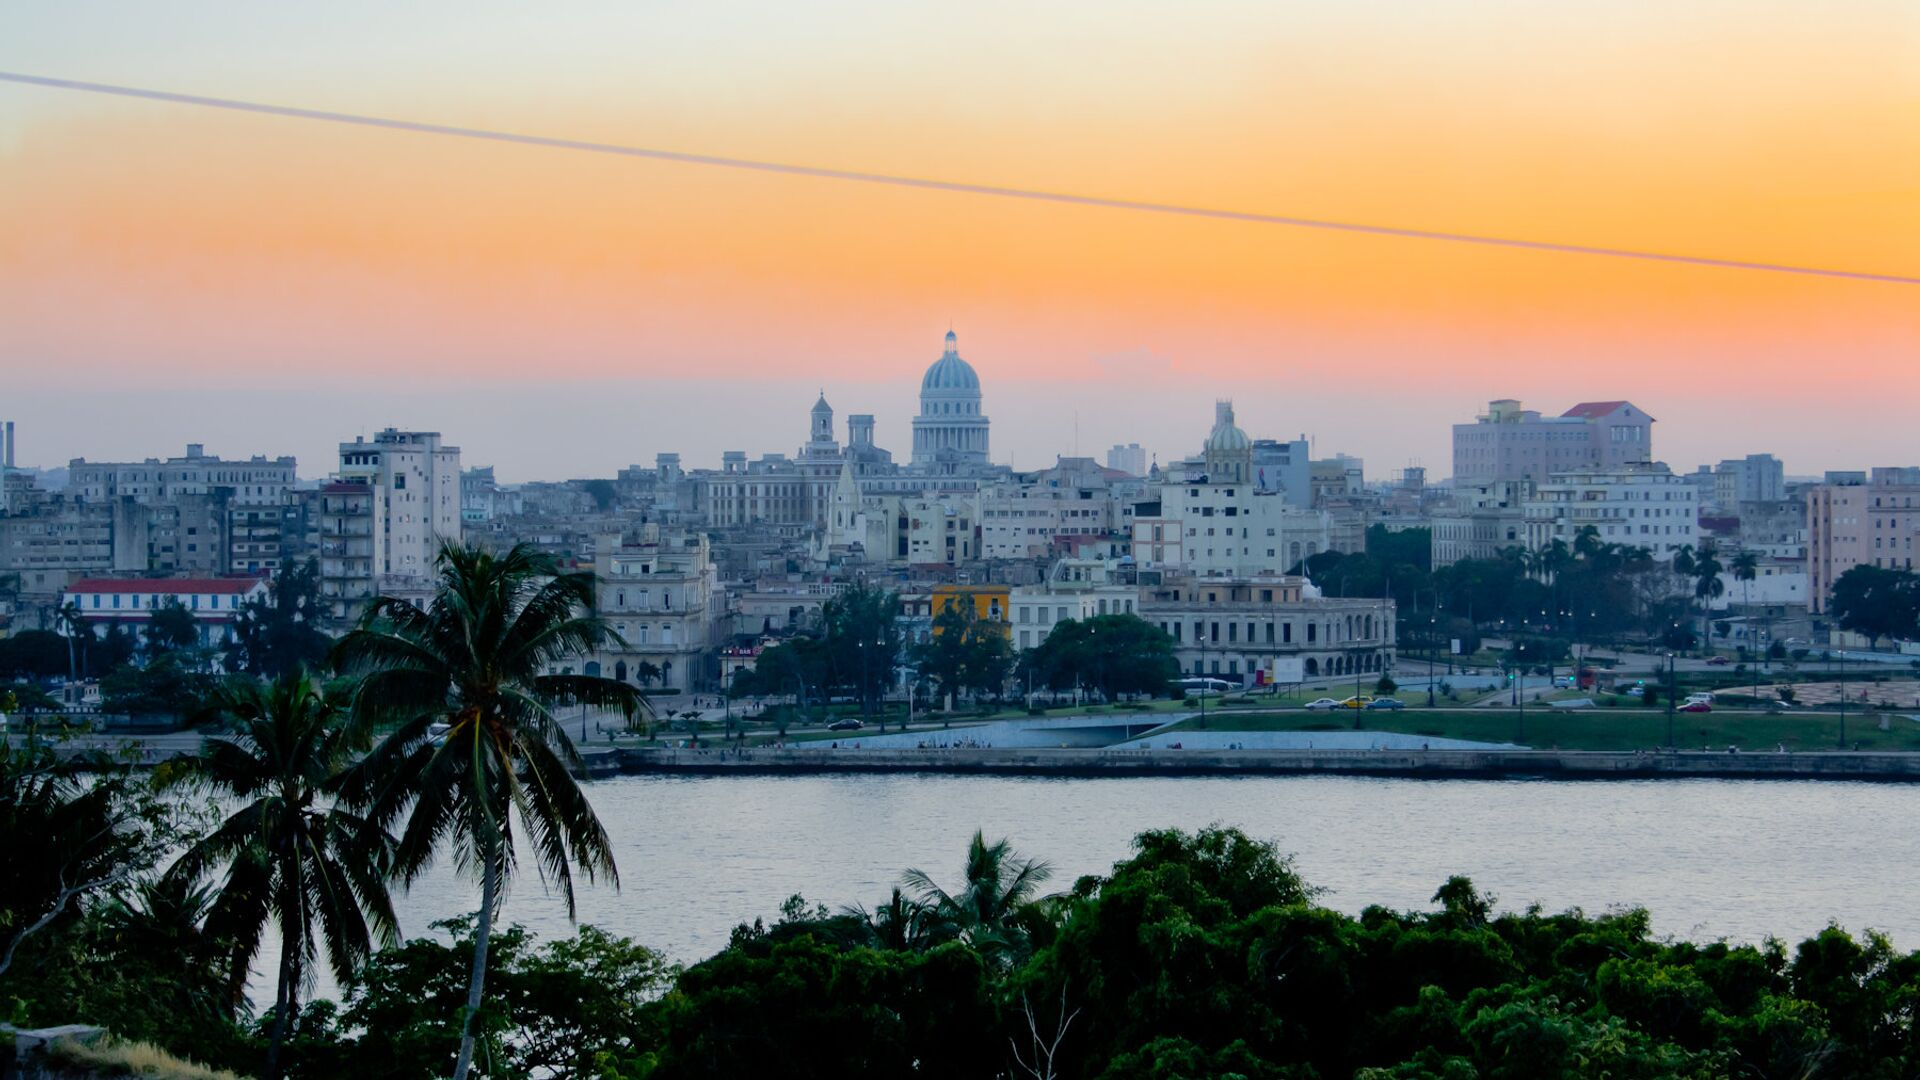 Atardecer en La Habana - Sputnik Mundo, 1920, 19.09.2021